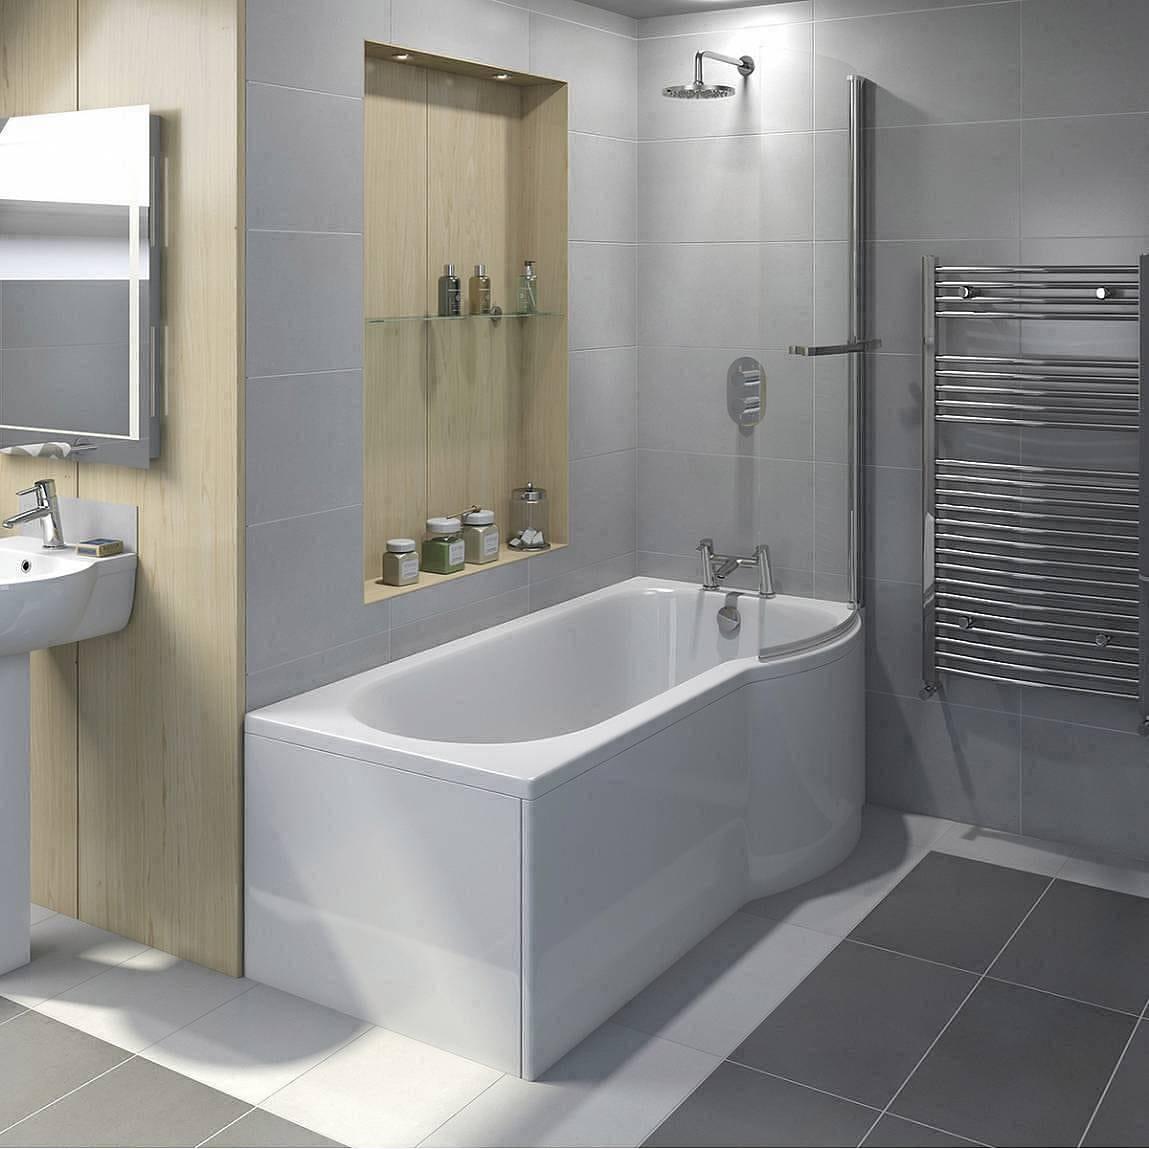 Evesham Shower Bath Screen with Towel Rail